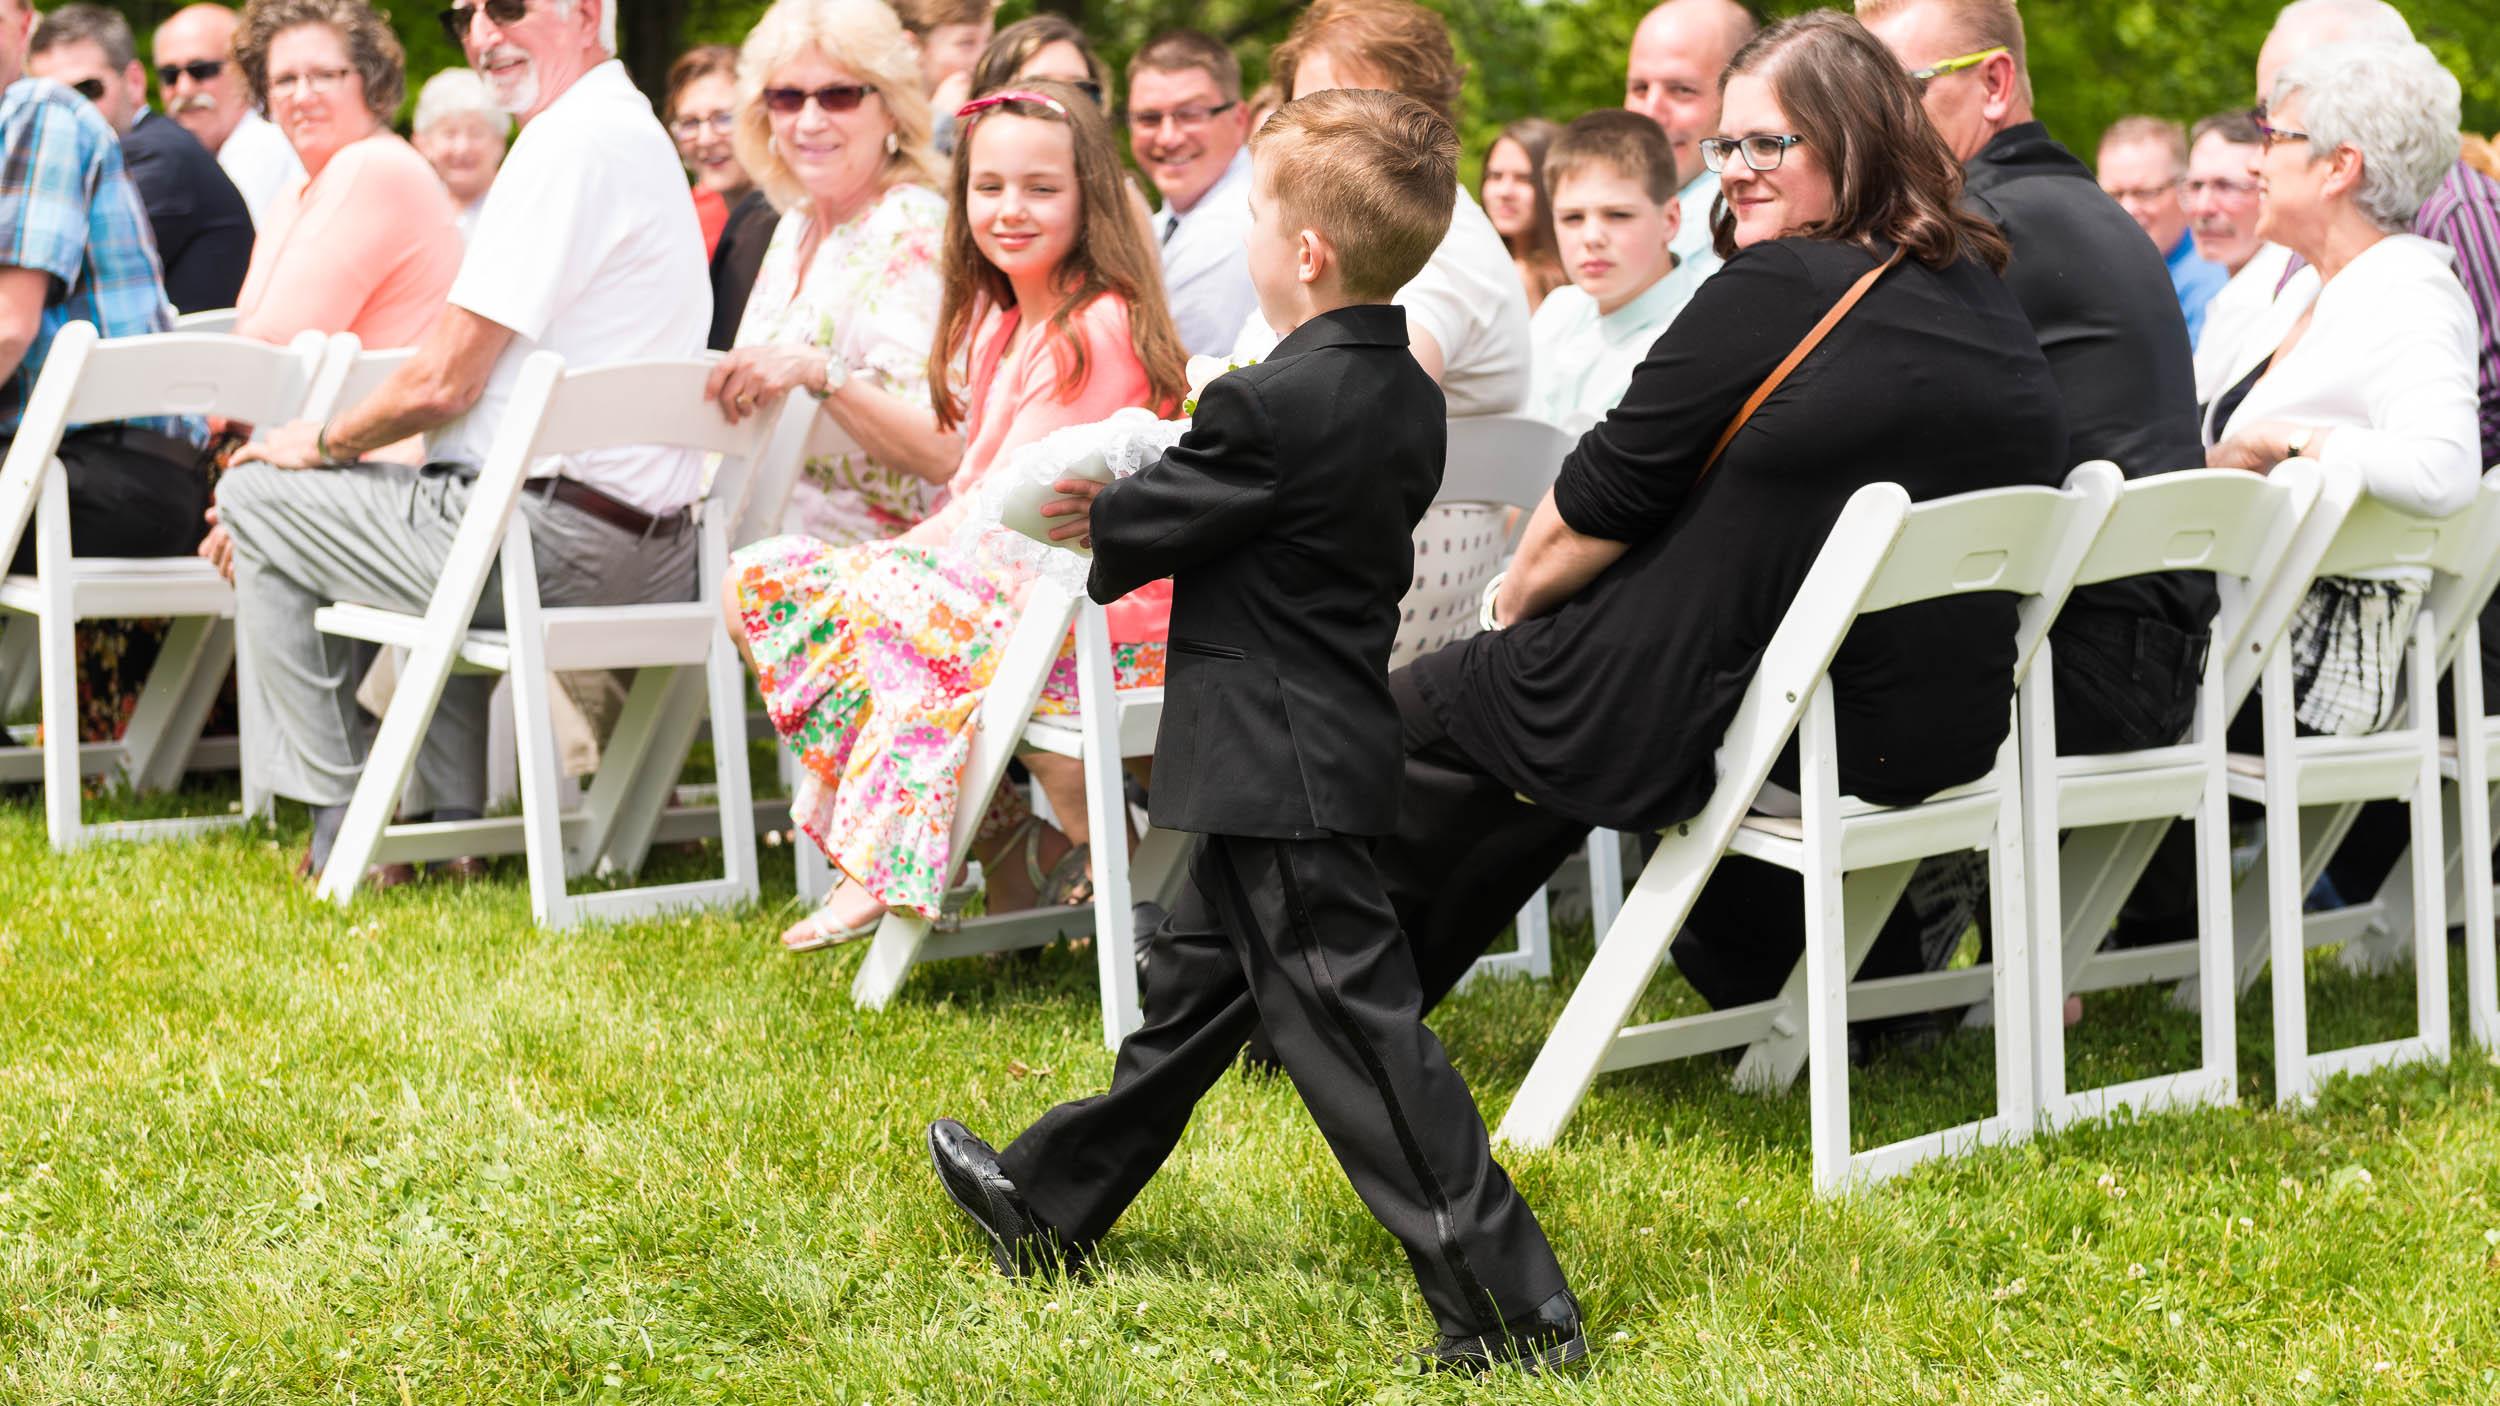 Ring-bearer-Wedding-outdoor-ceremony.jpg